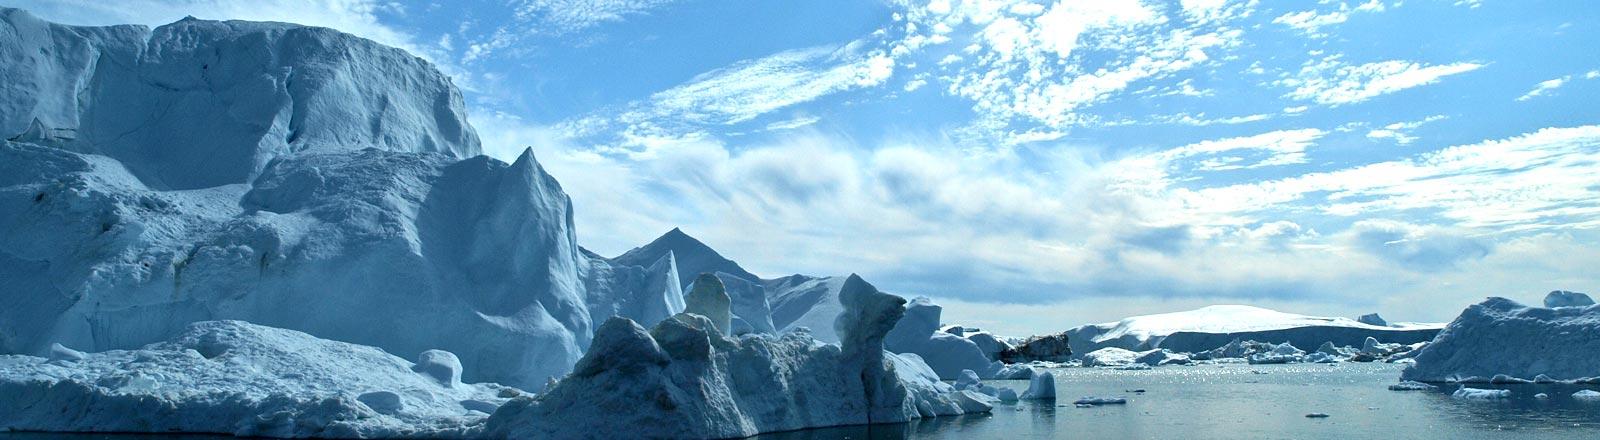 Eisberge am Nordpol.